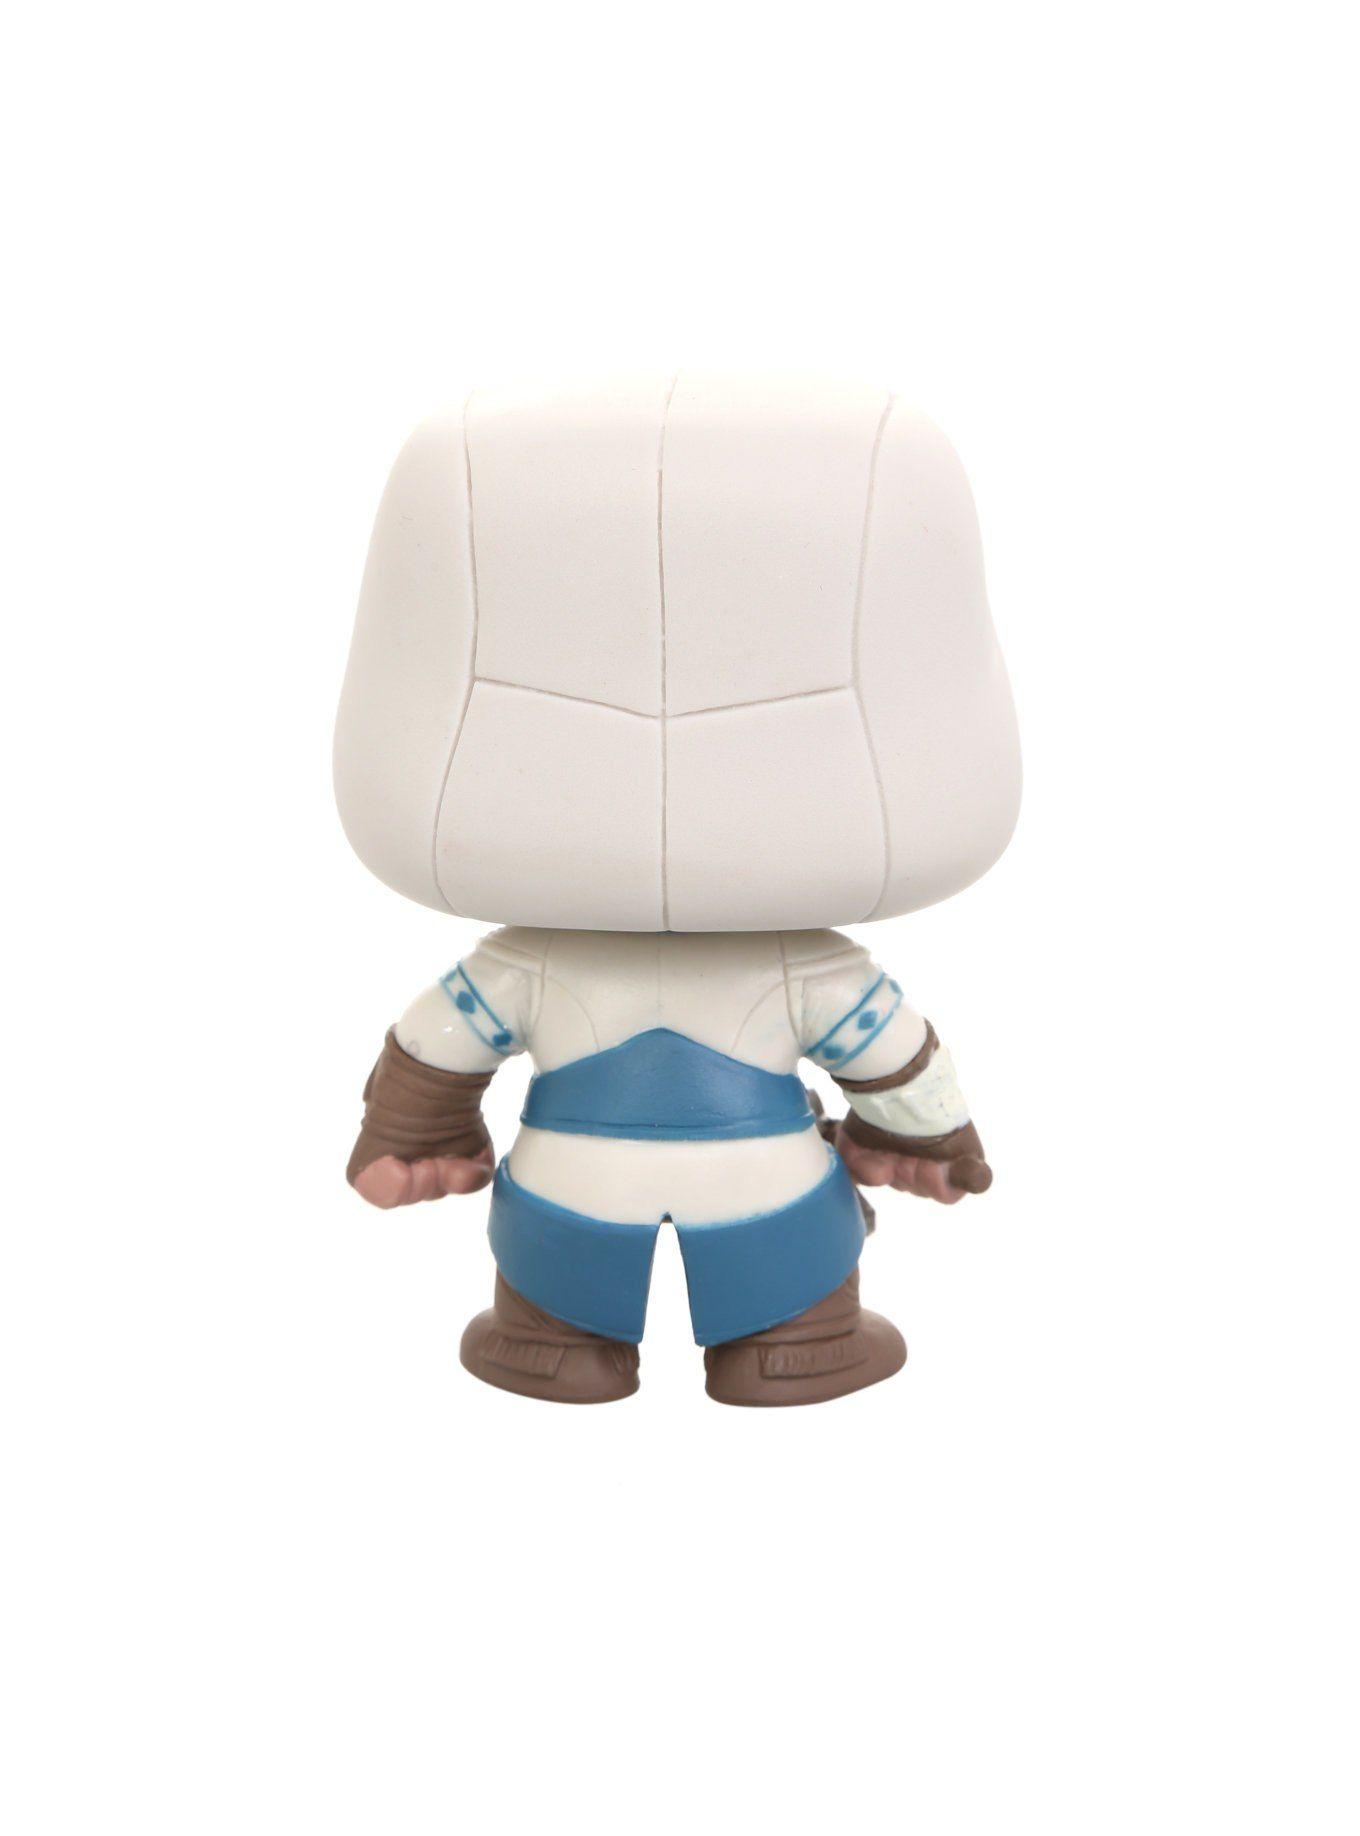 Connor #22 - Assassins Creed - Funko Pop! Games